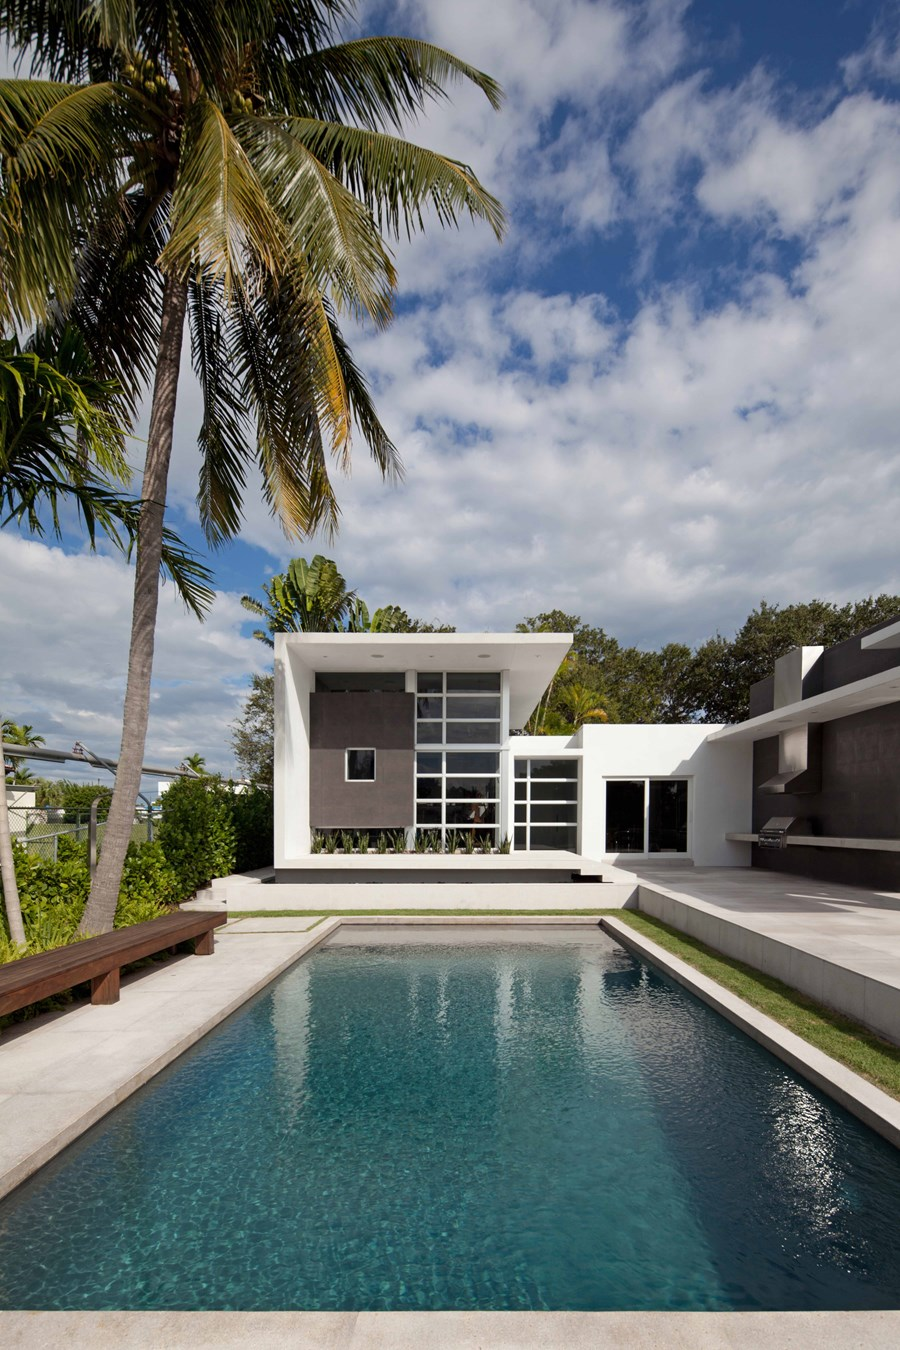 Lakewood Art Studio by KZ Architecture 12